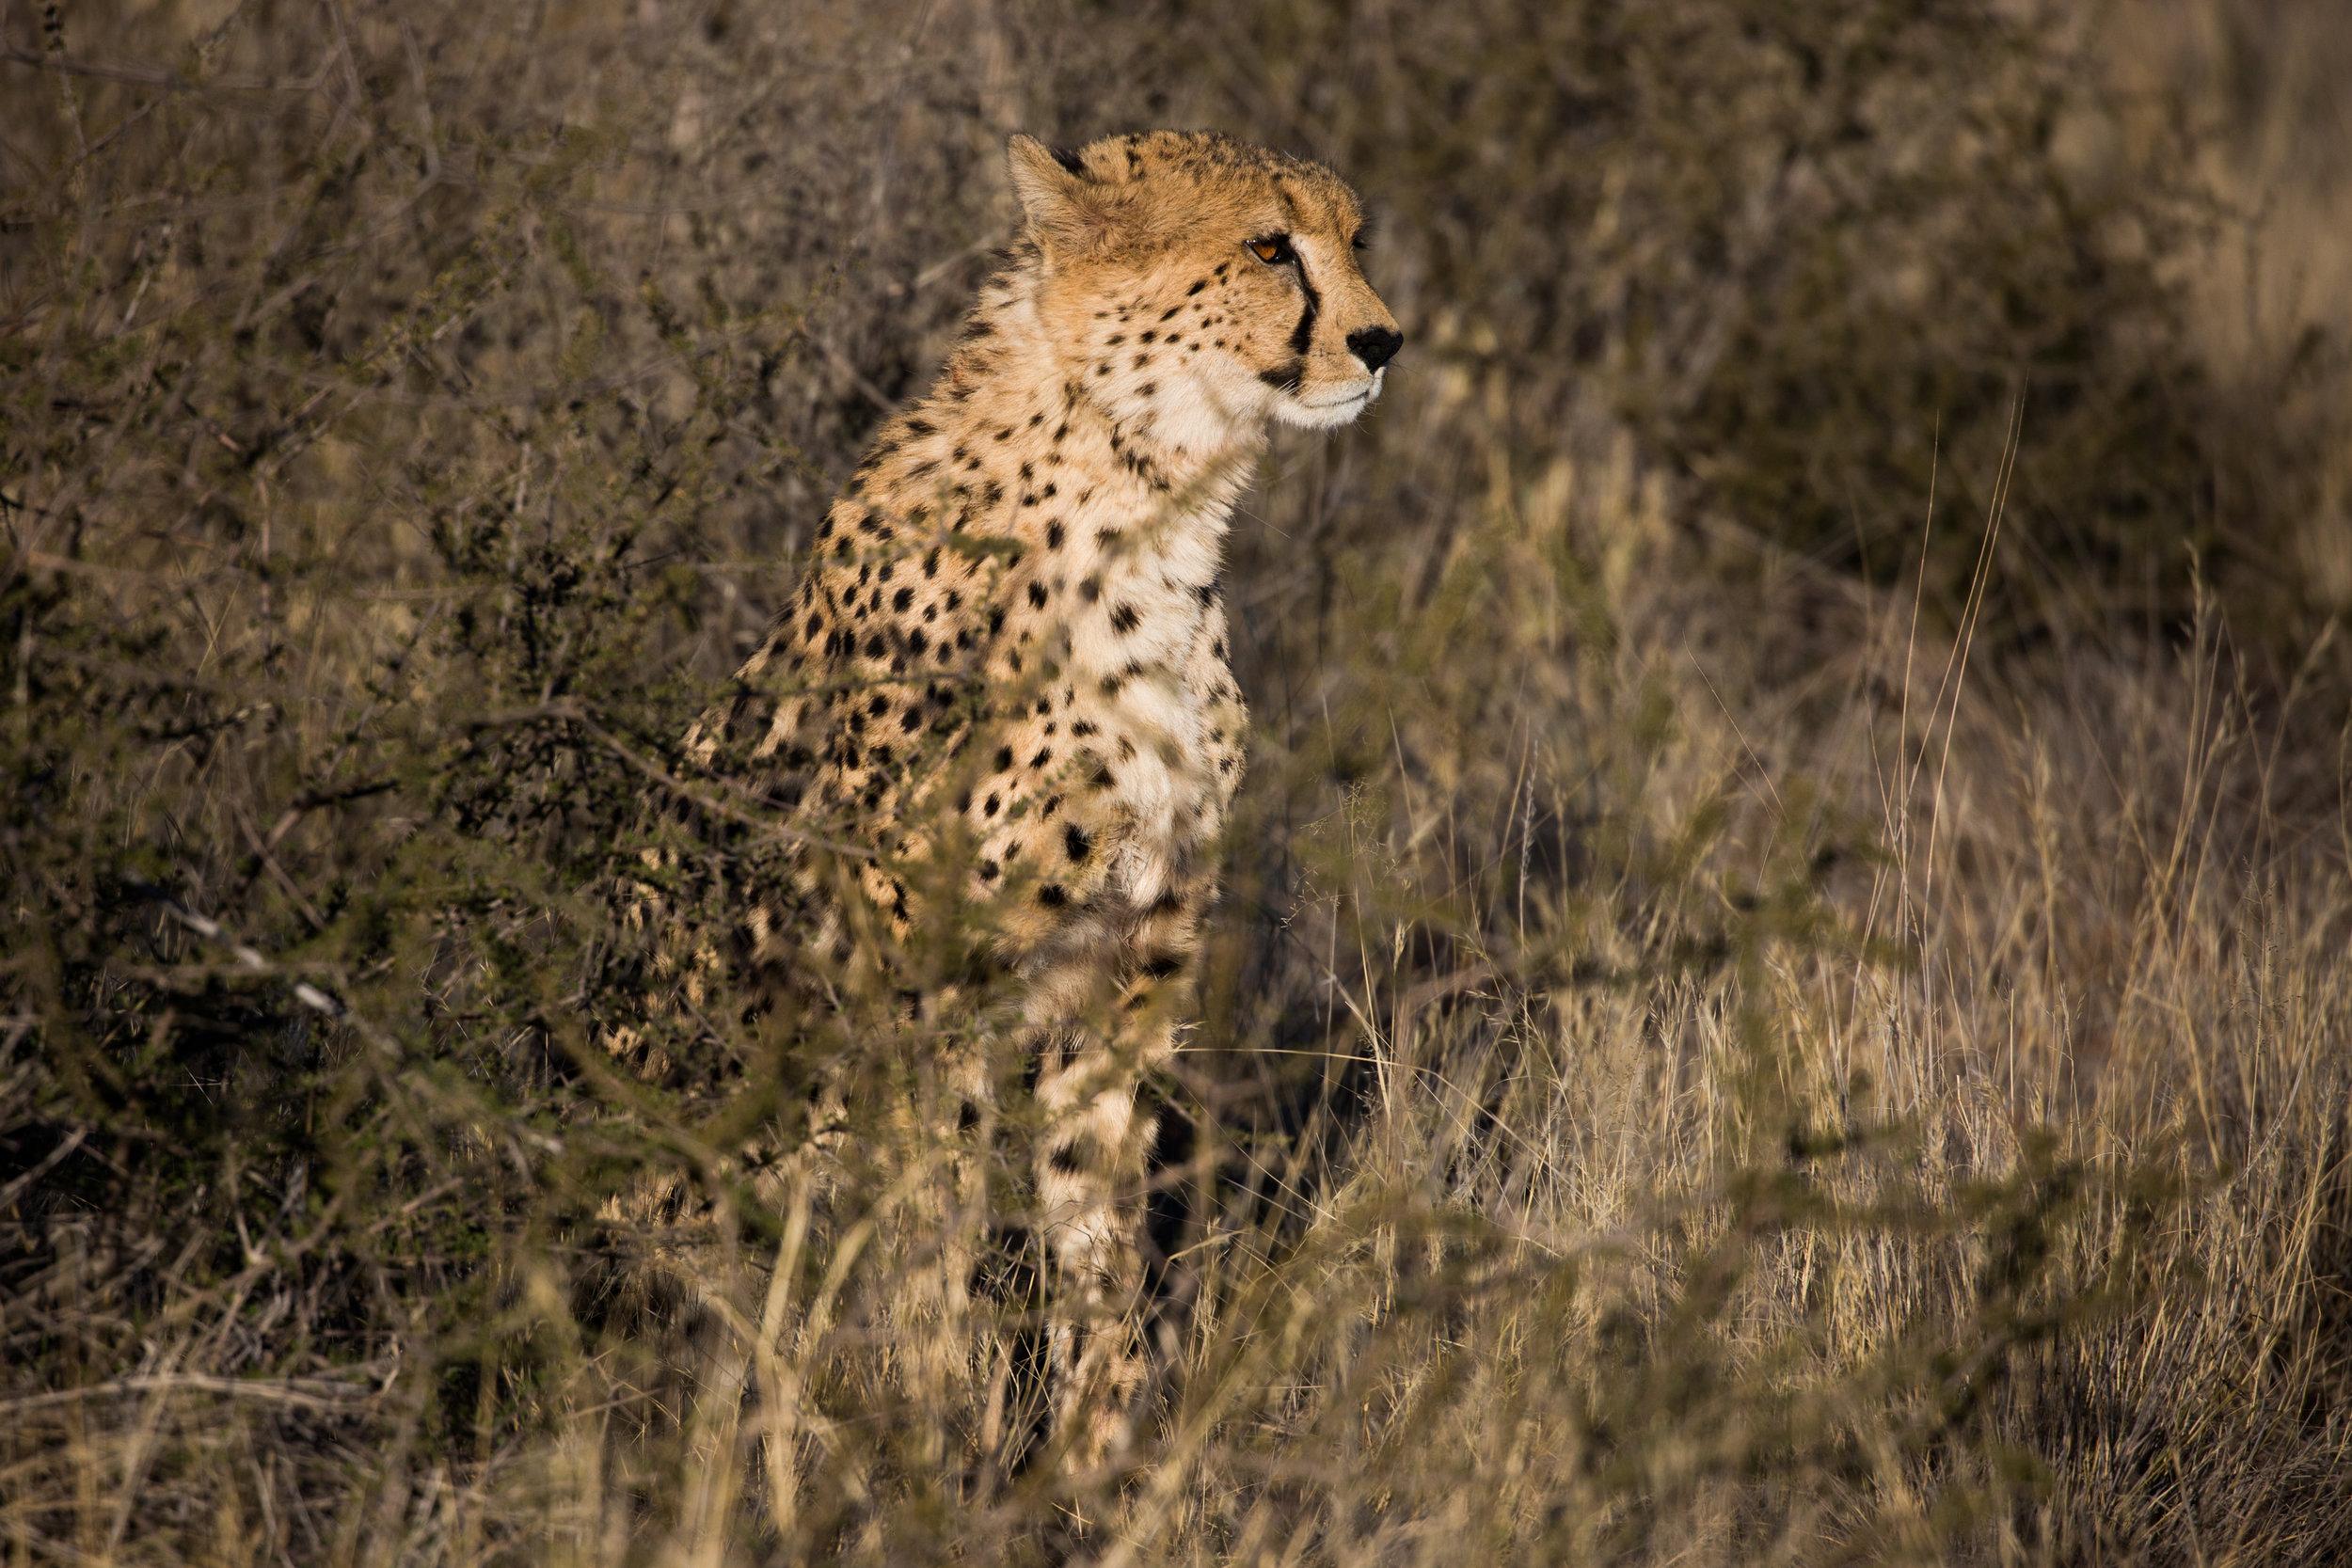 FM_Partnership_ResponsibleSourcing_Website_CheetahImage.jpg